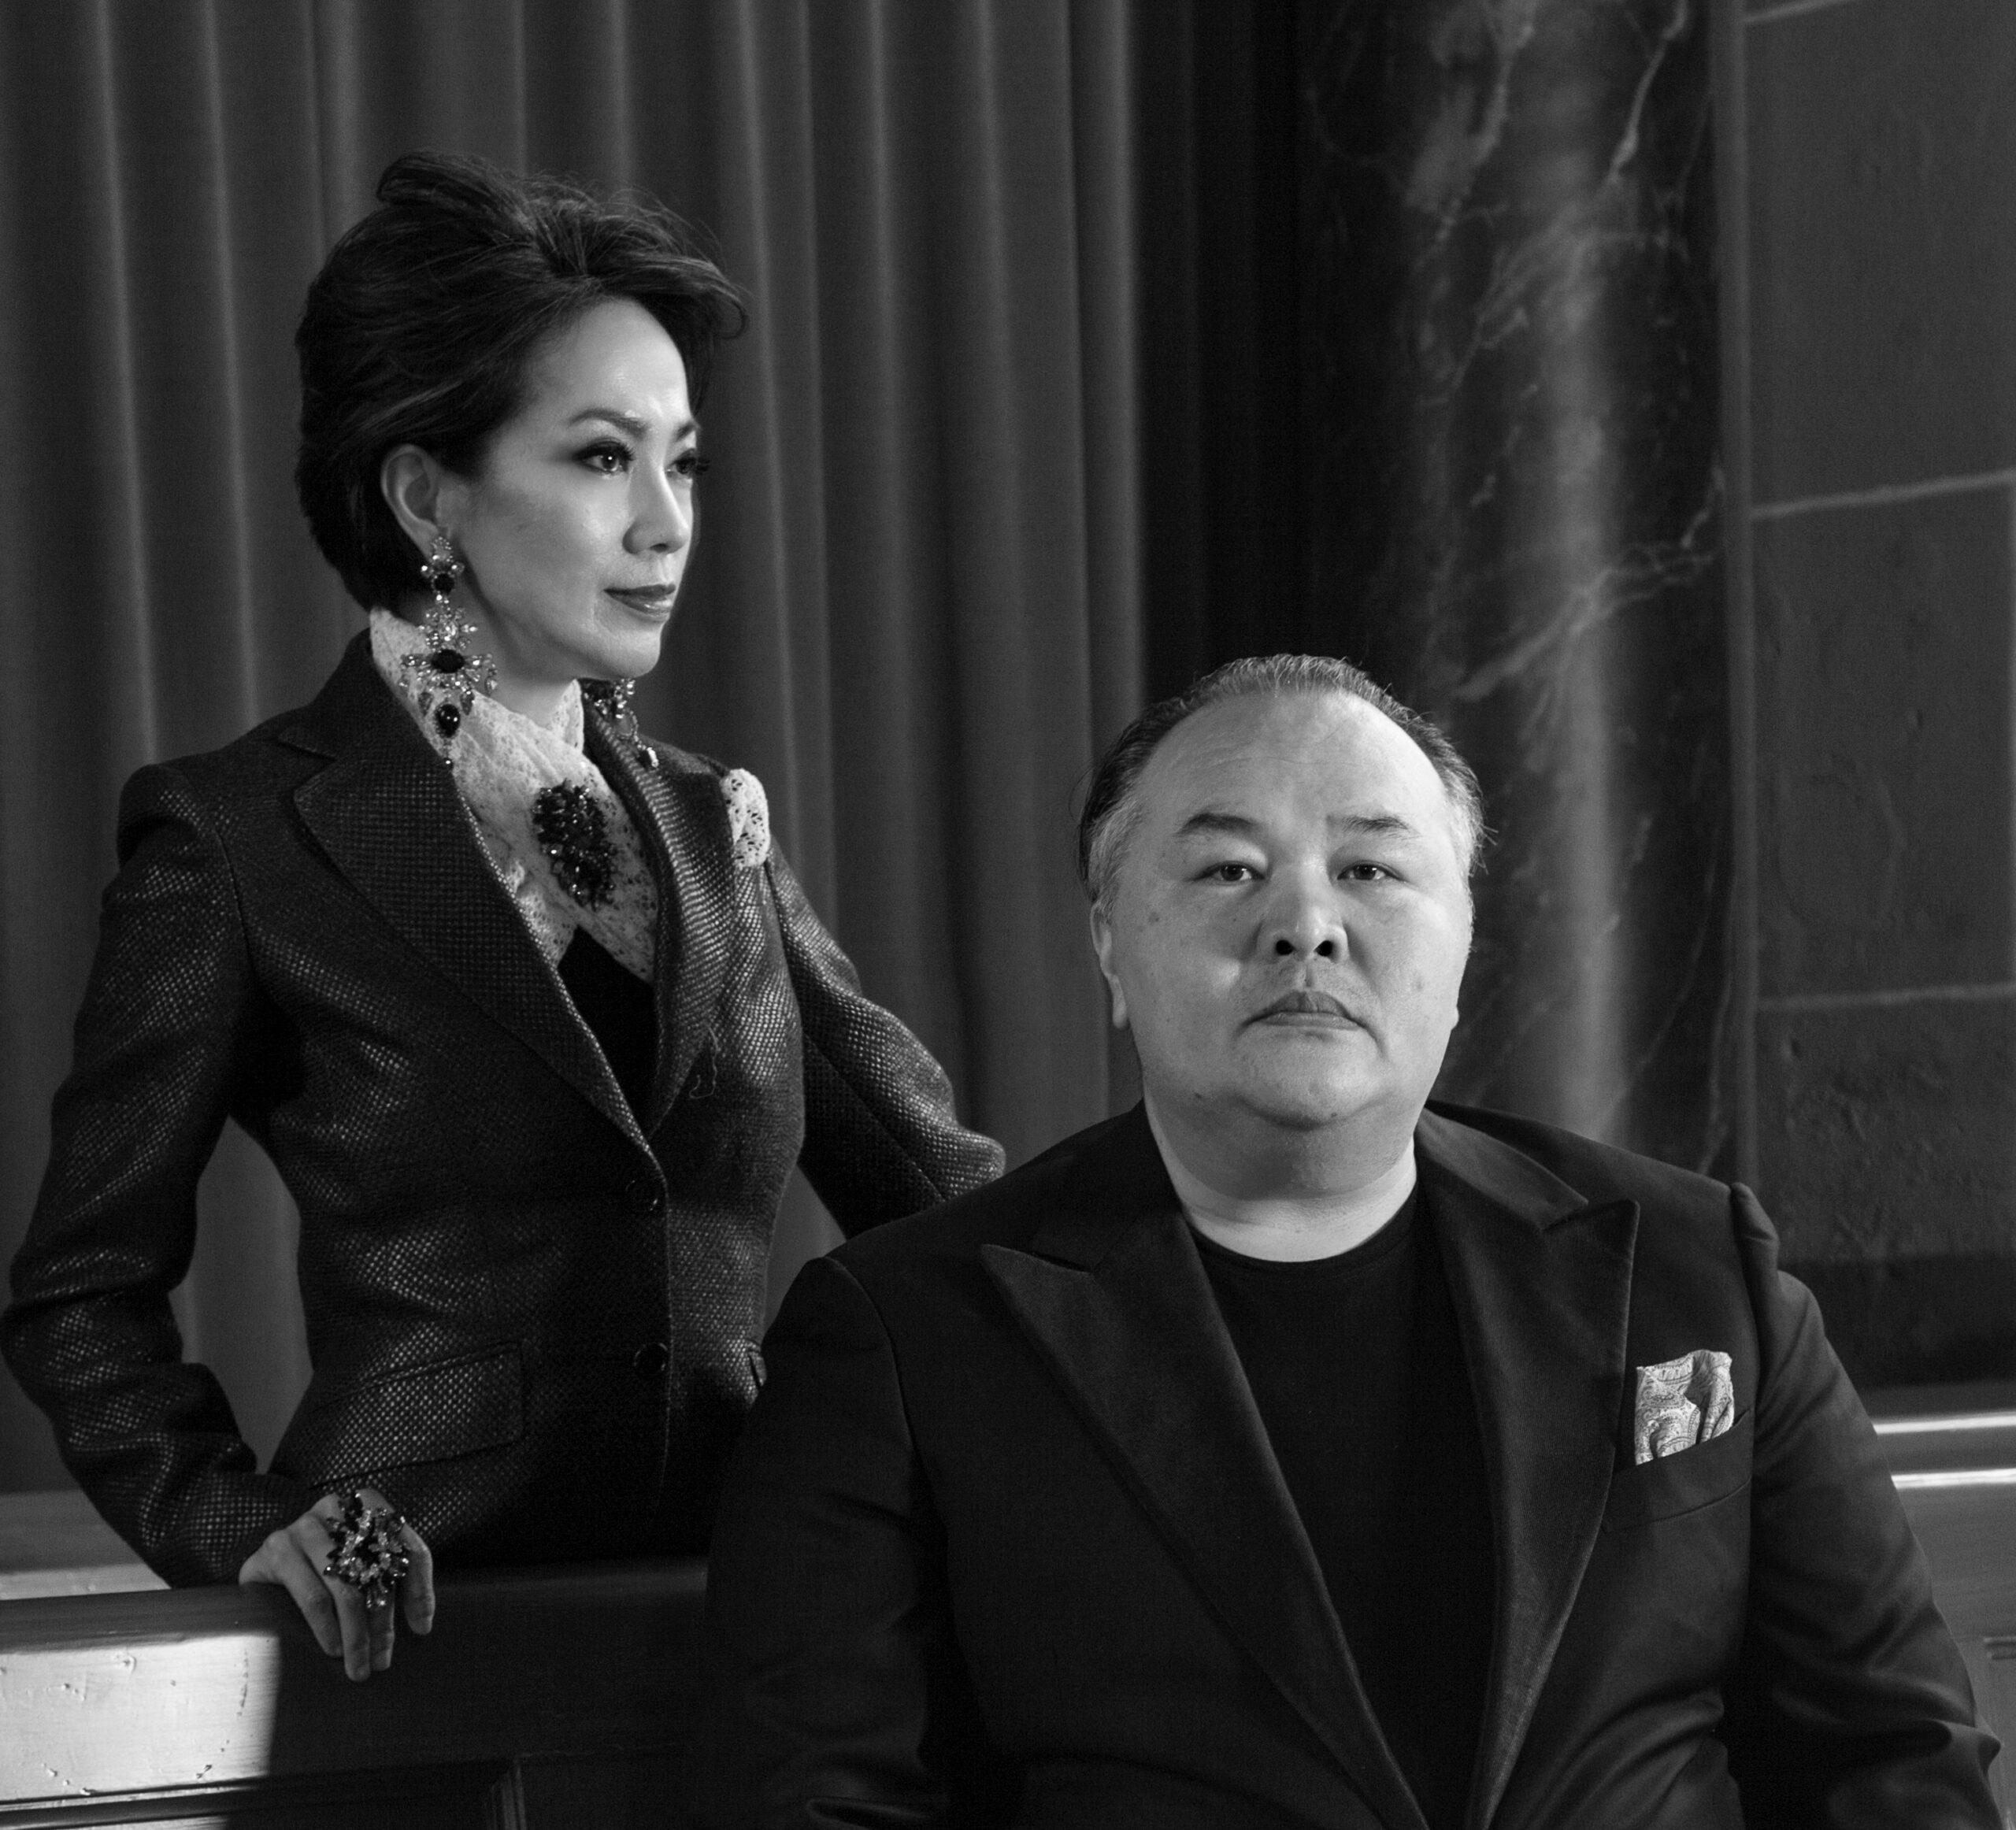 Imelda & Eduardo - Founders of BAROQCO